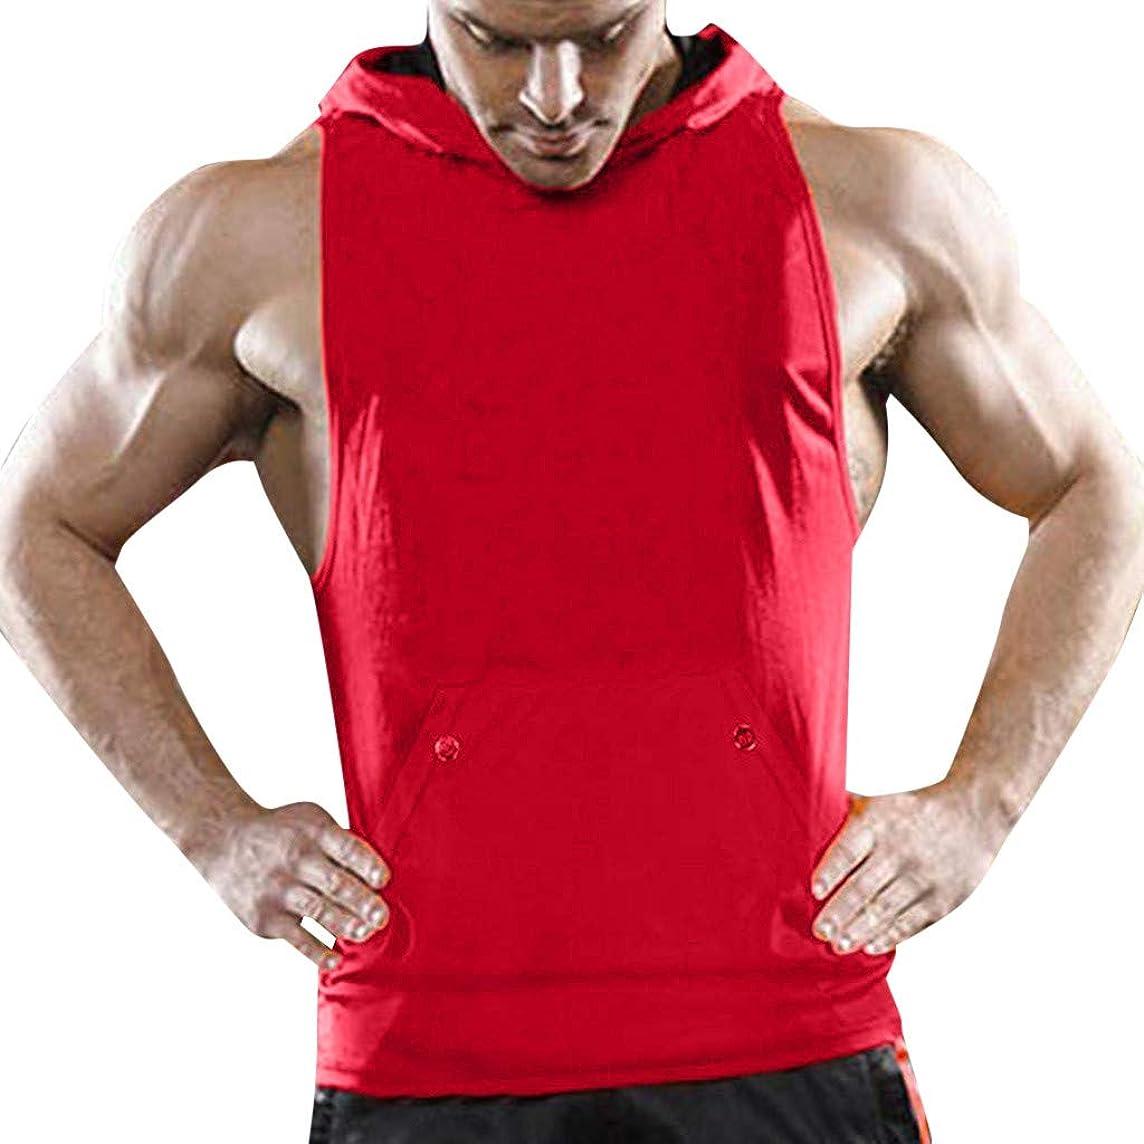 iHPH7 Men's Tank Tops Sleeveless T-Shirt #19052714